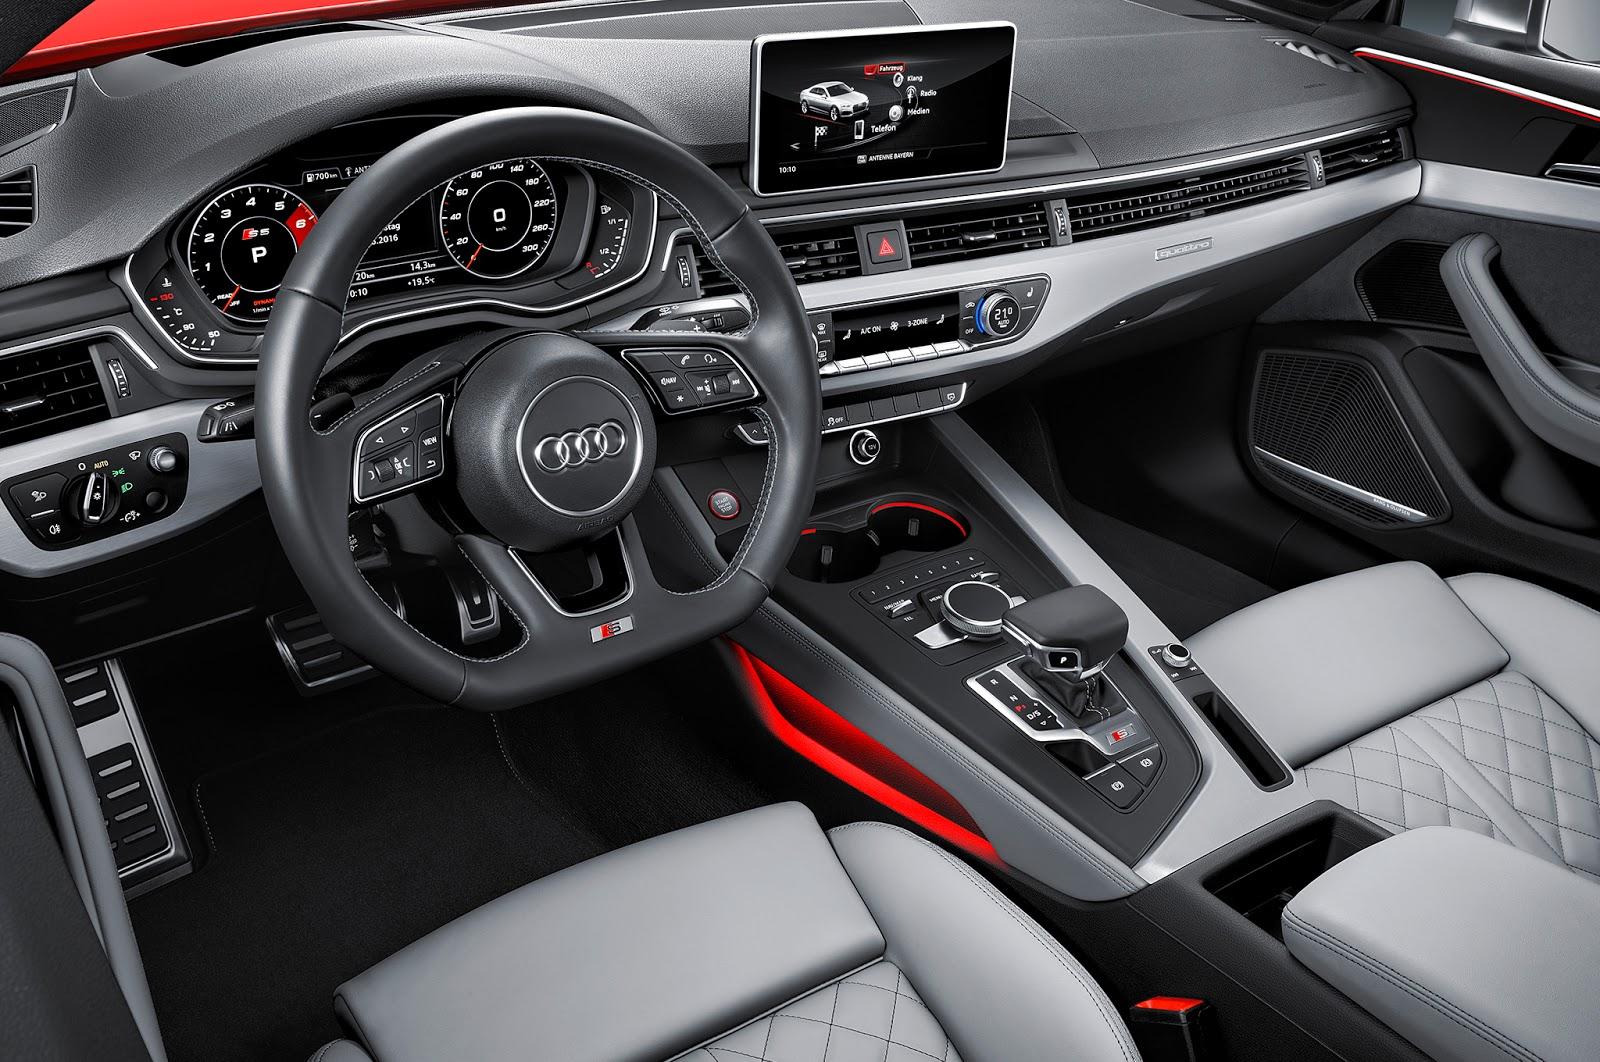 Audi A3 Lease >> 2019 Audi S5 price, sportback, coupe, convertible, lease ...